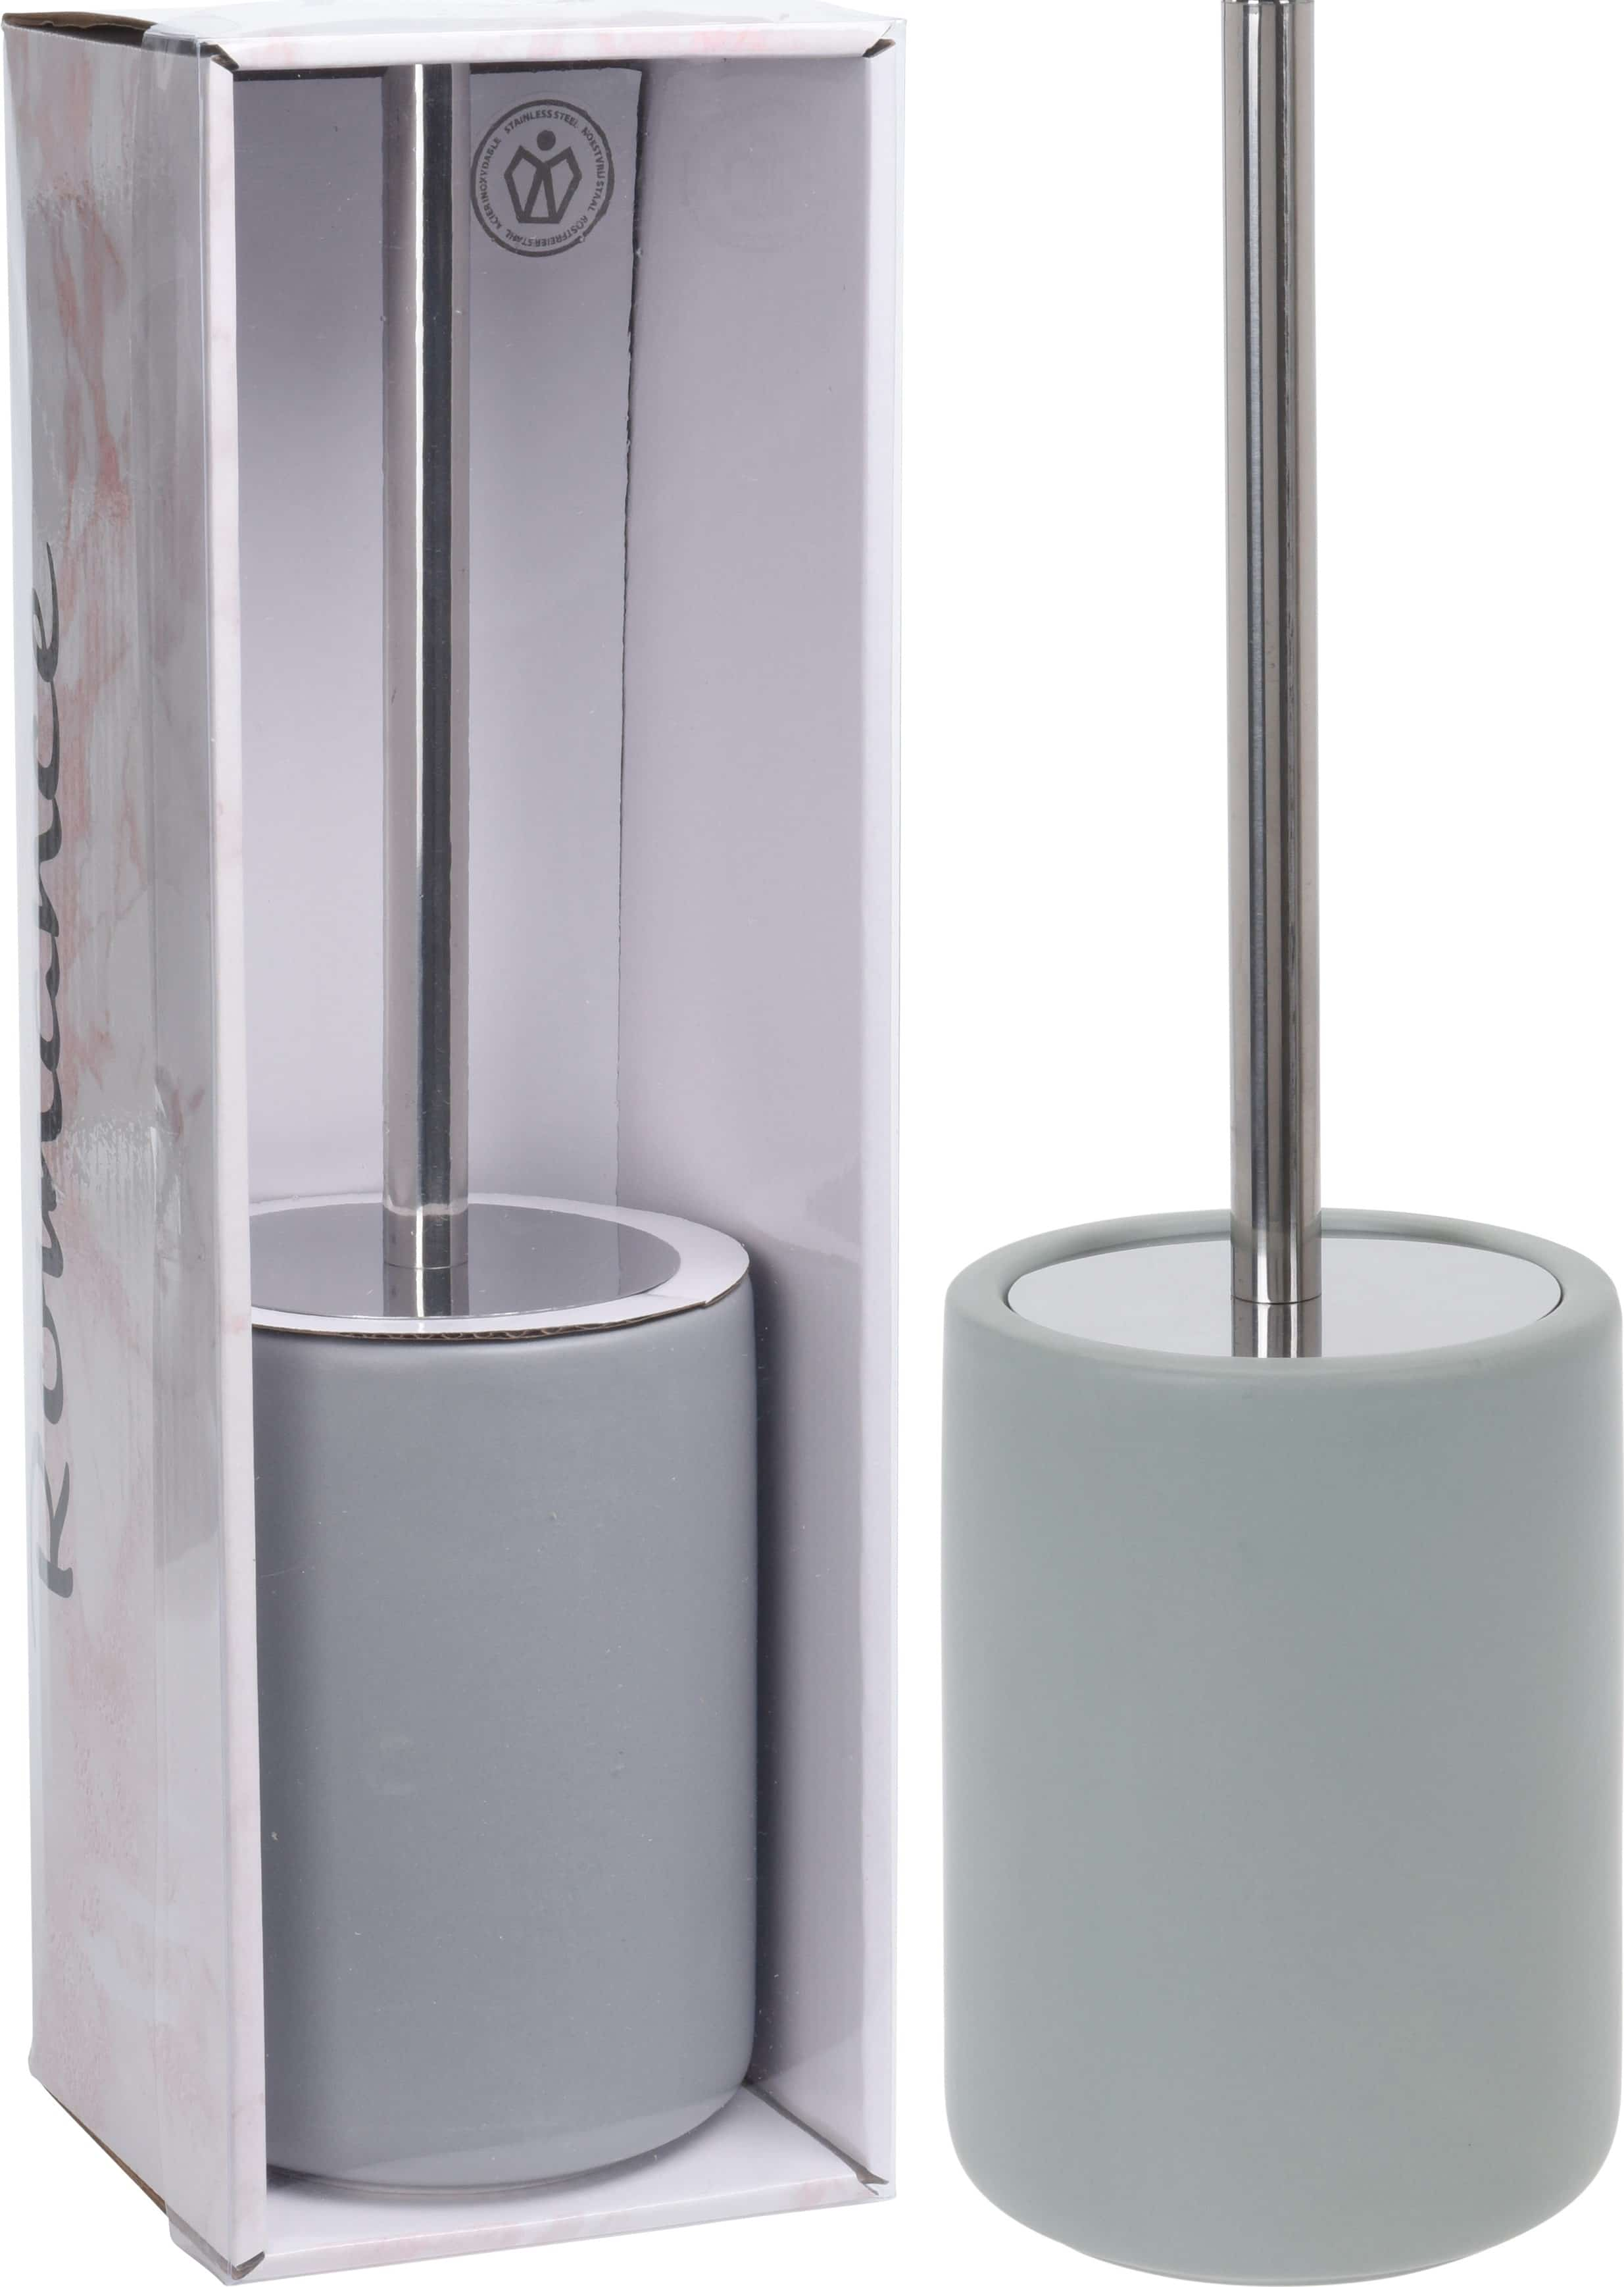 4goodz Toiletborstel in houder - kleur Mintgroen